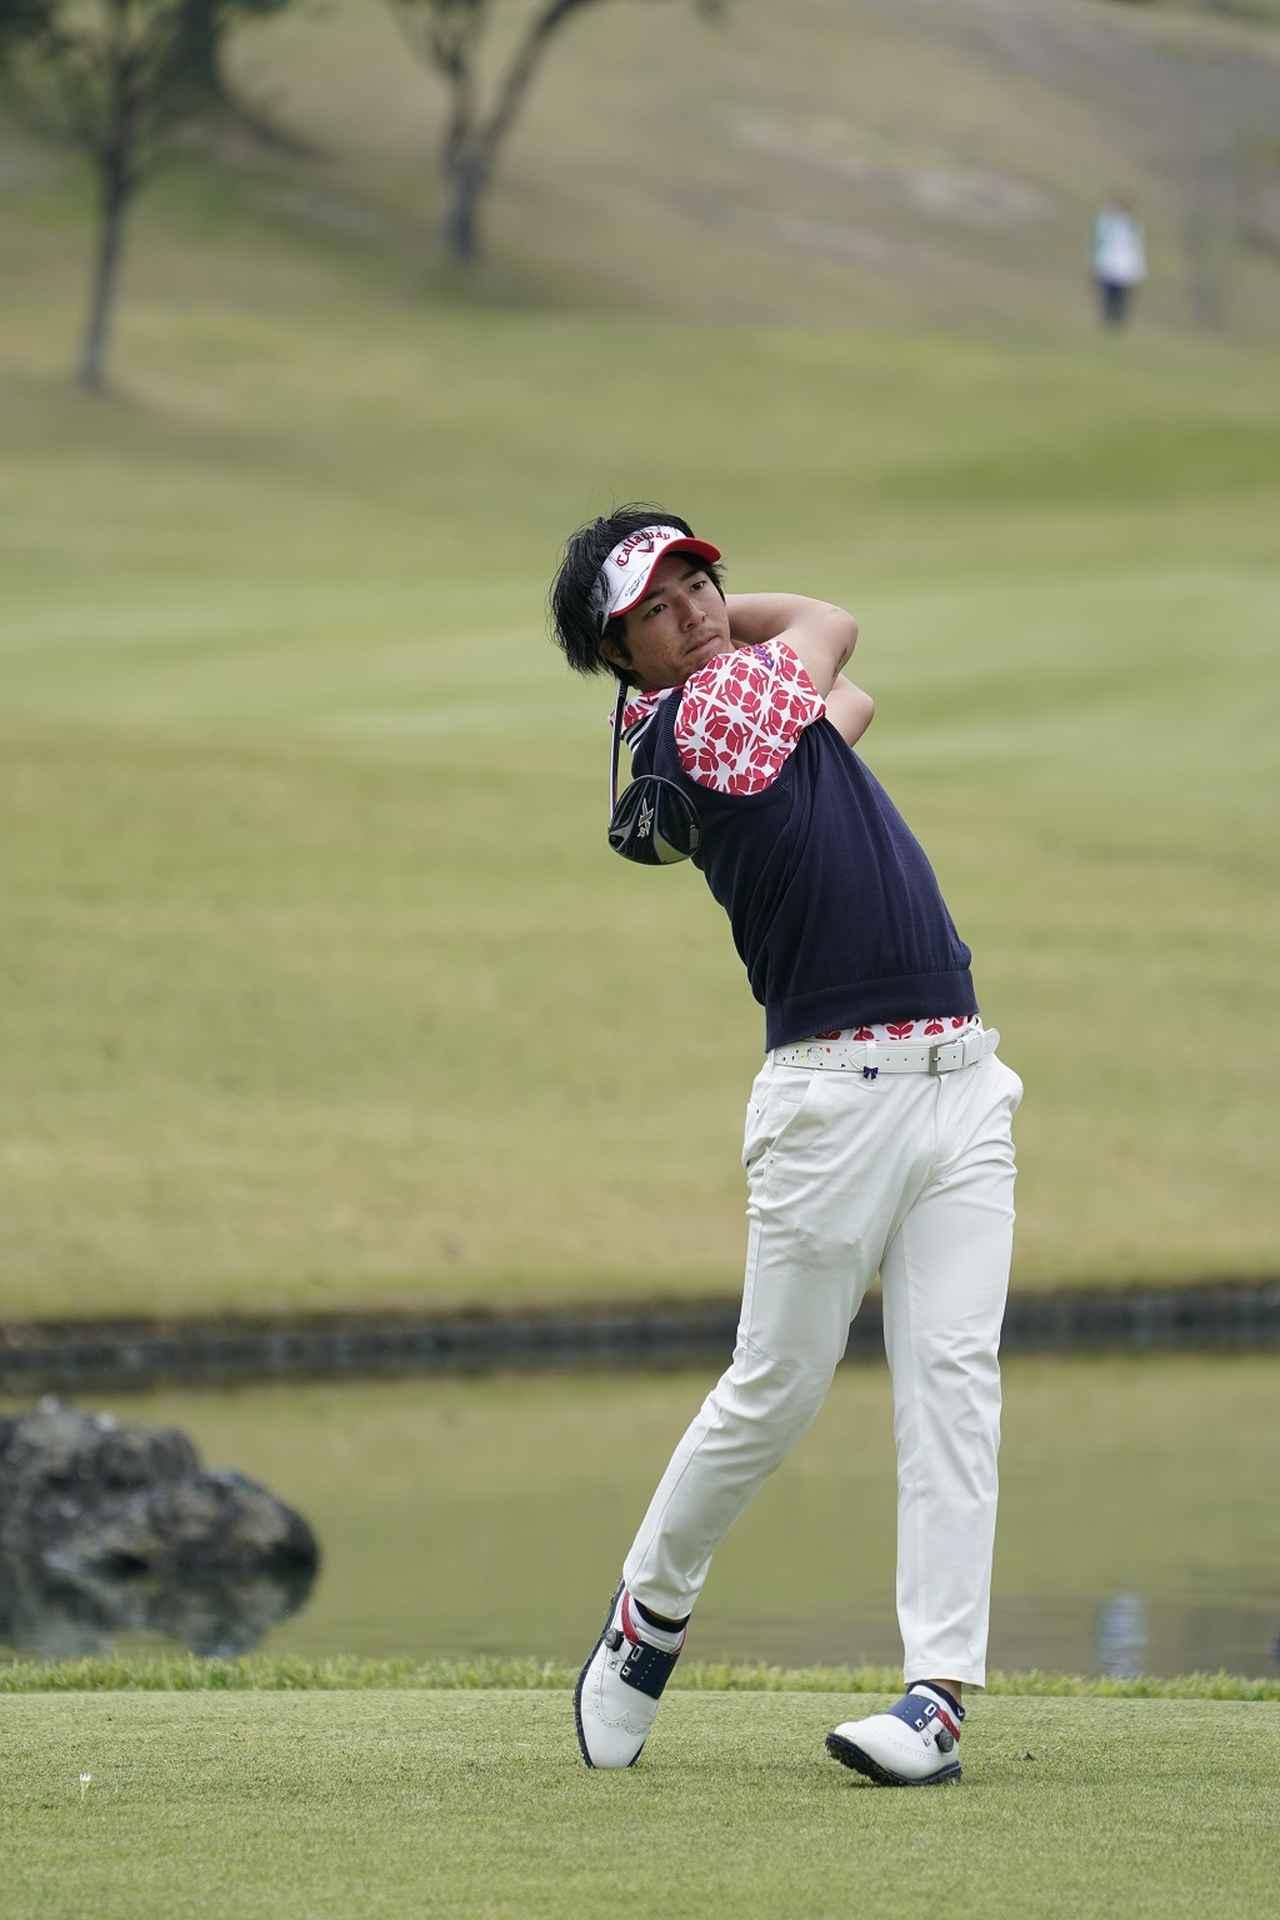 Images : 17番目の画像 - 石川遼ドライバー前方連続写真 - みんなのゴルフダイジェスト